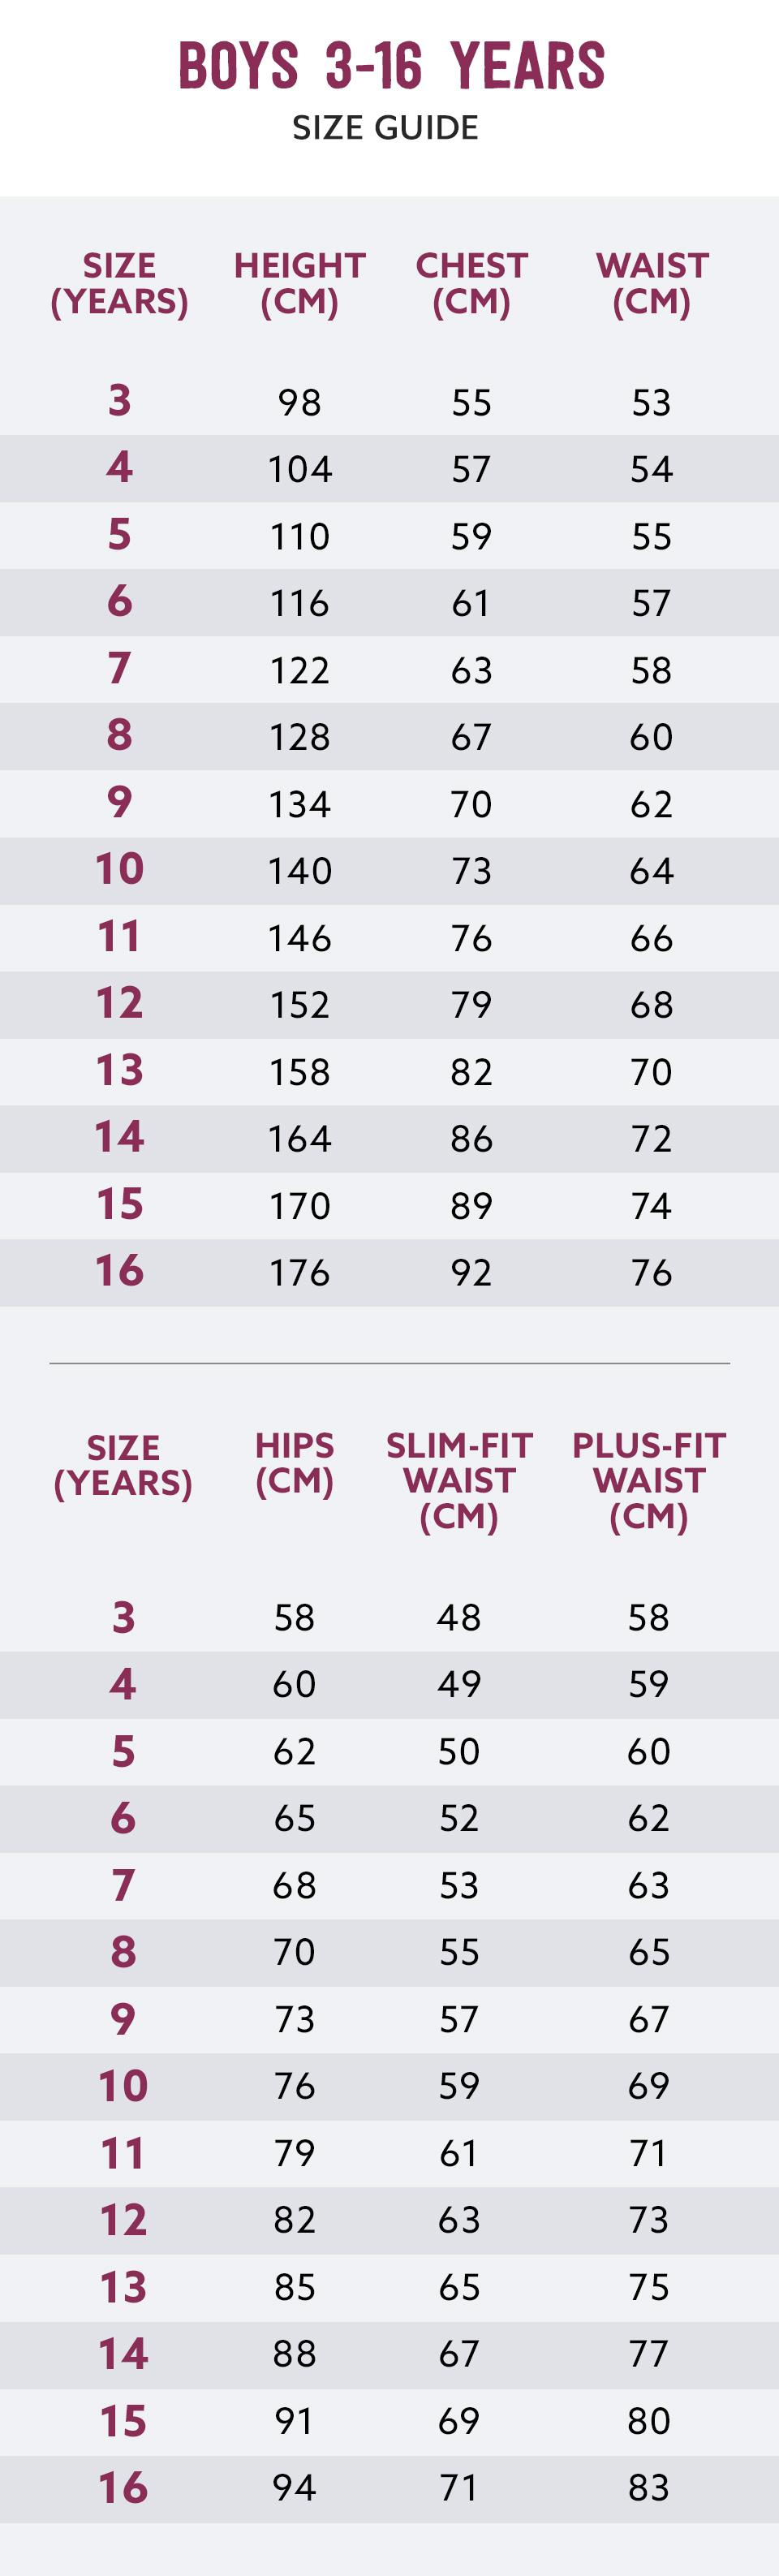 Converse Kids Shoe Size Chart : converse, chart, Prekršaj, Steći, Kontrolu, Pravedan, Converse, Chart, Jamisonlandscaping.com